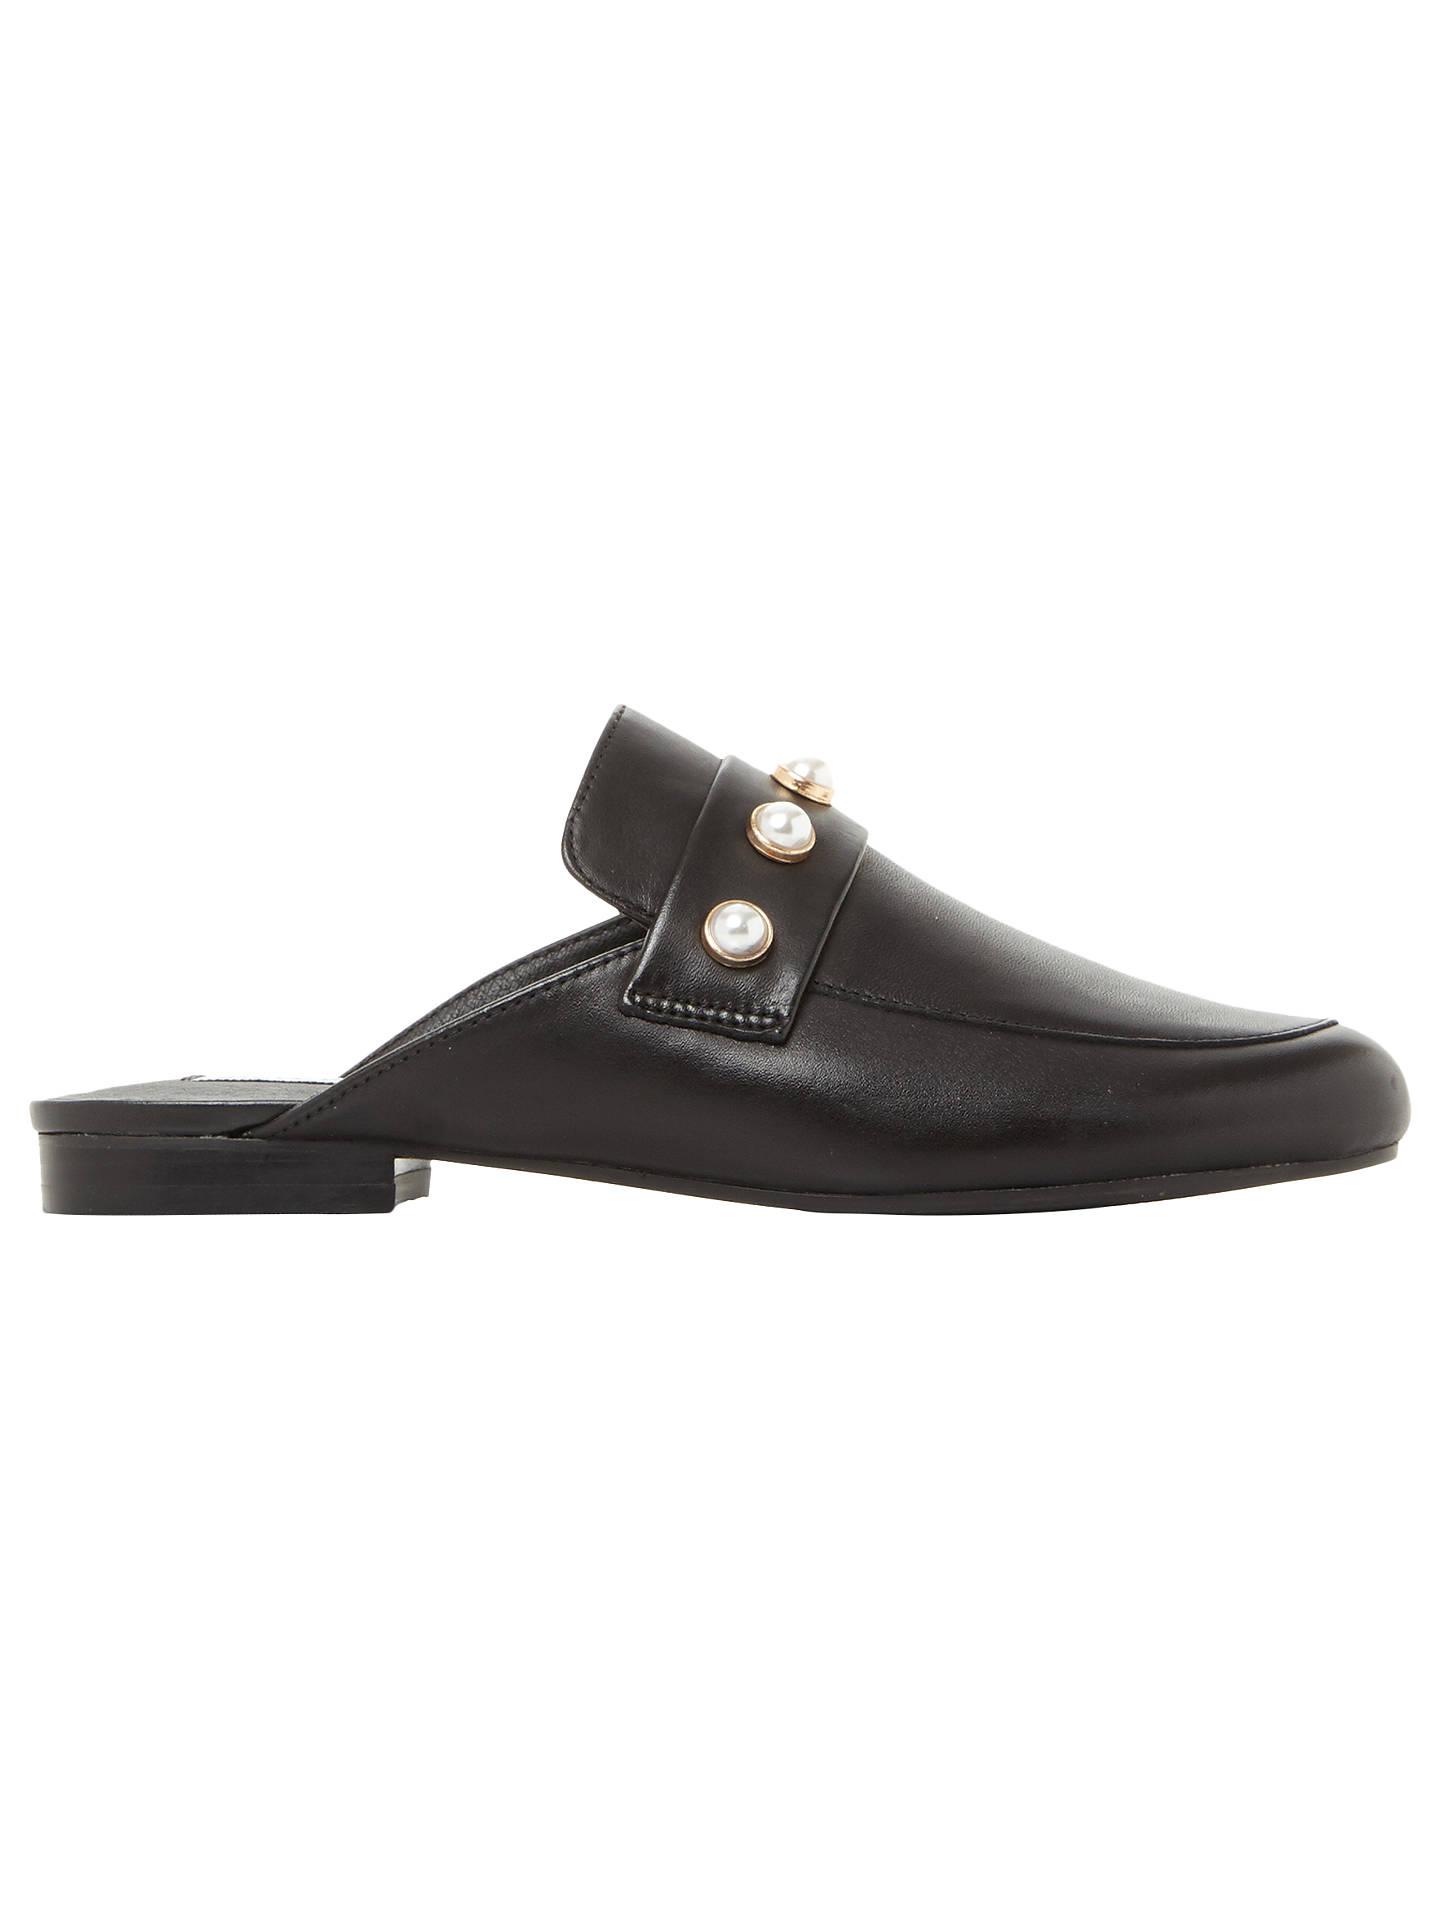 029e39e4142 Steve Madden Kandi-P Embellished Mule Loafers, Black at John Lewis ...